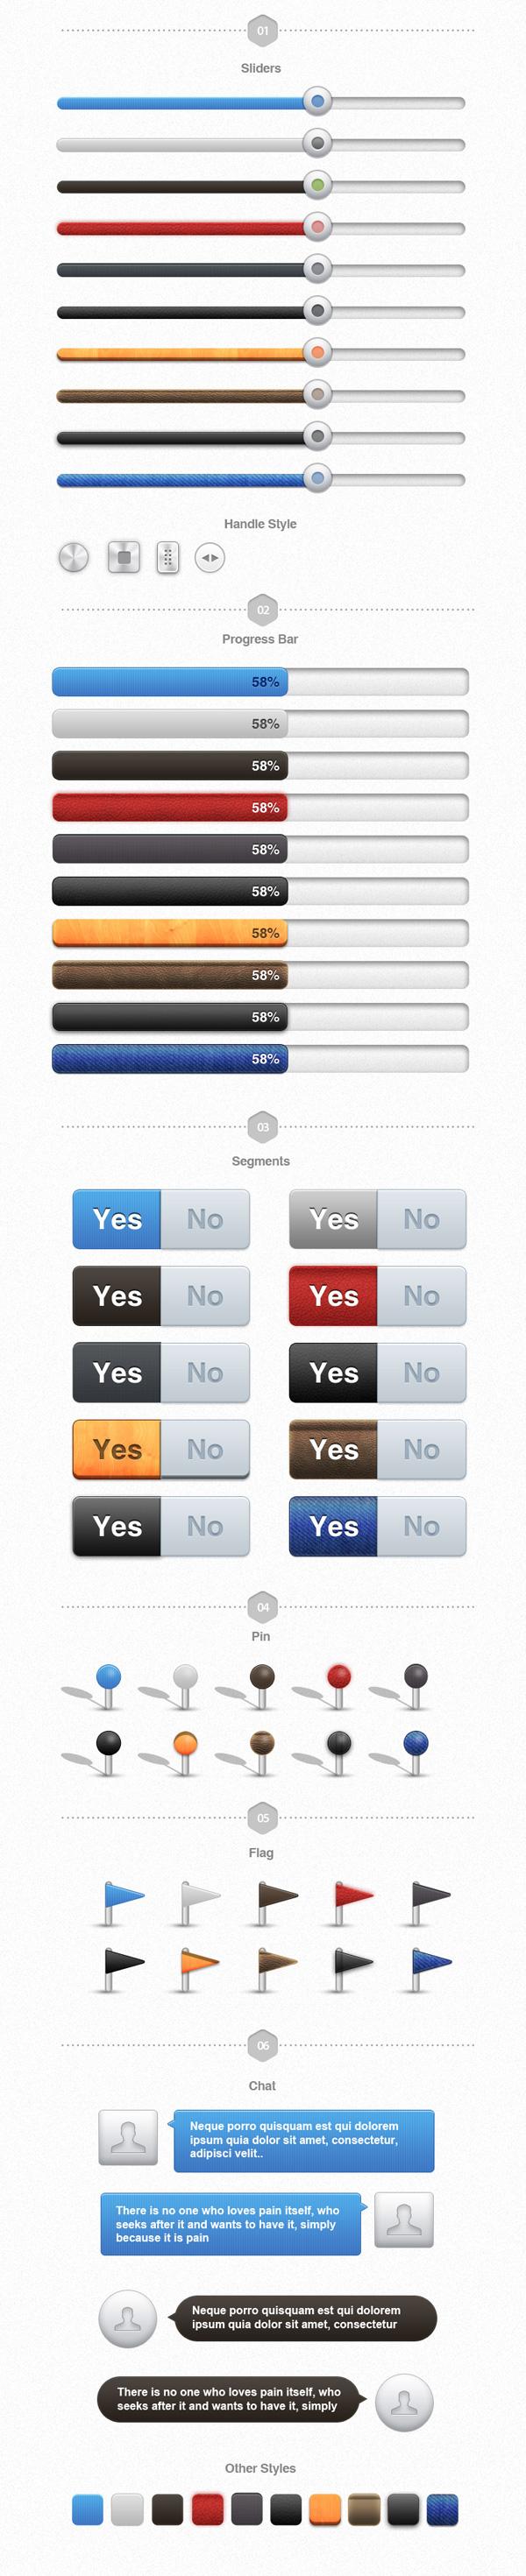 Ipad Design Dimensions Use For Iphone/ipad App Design